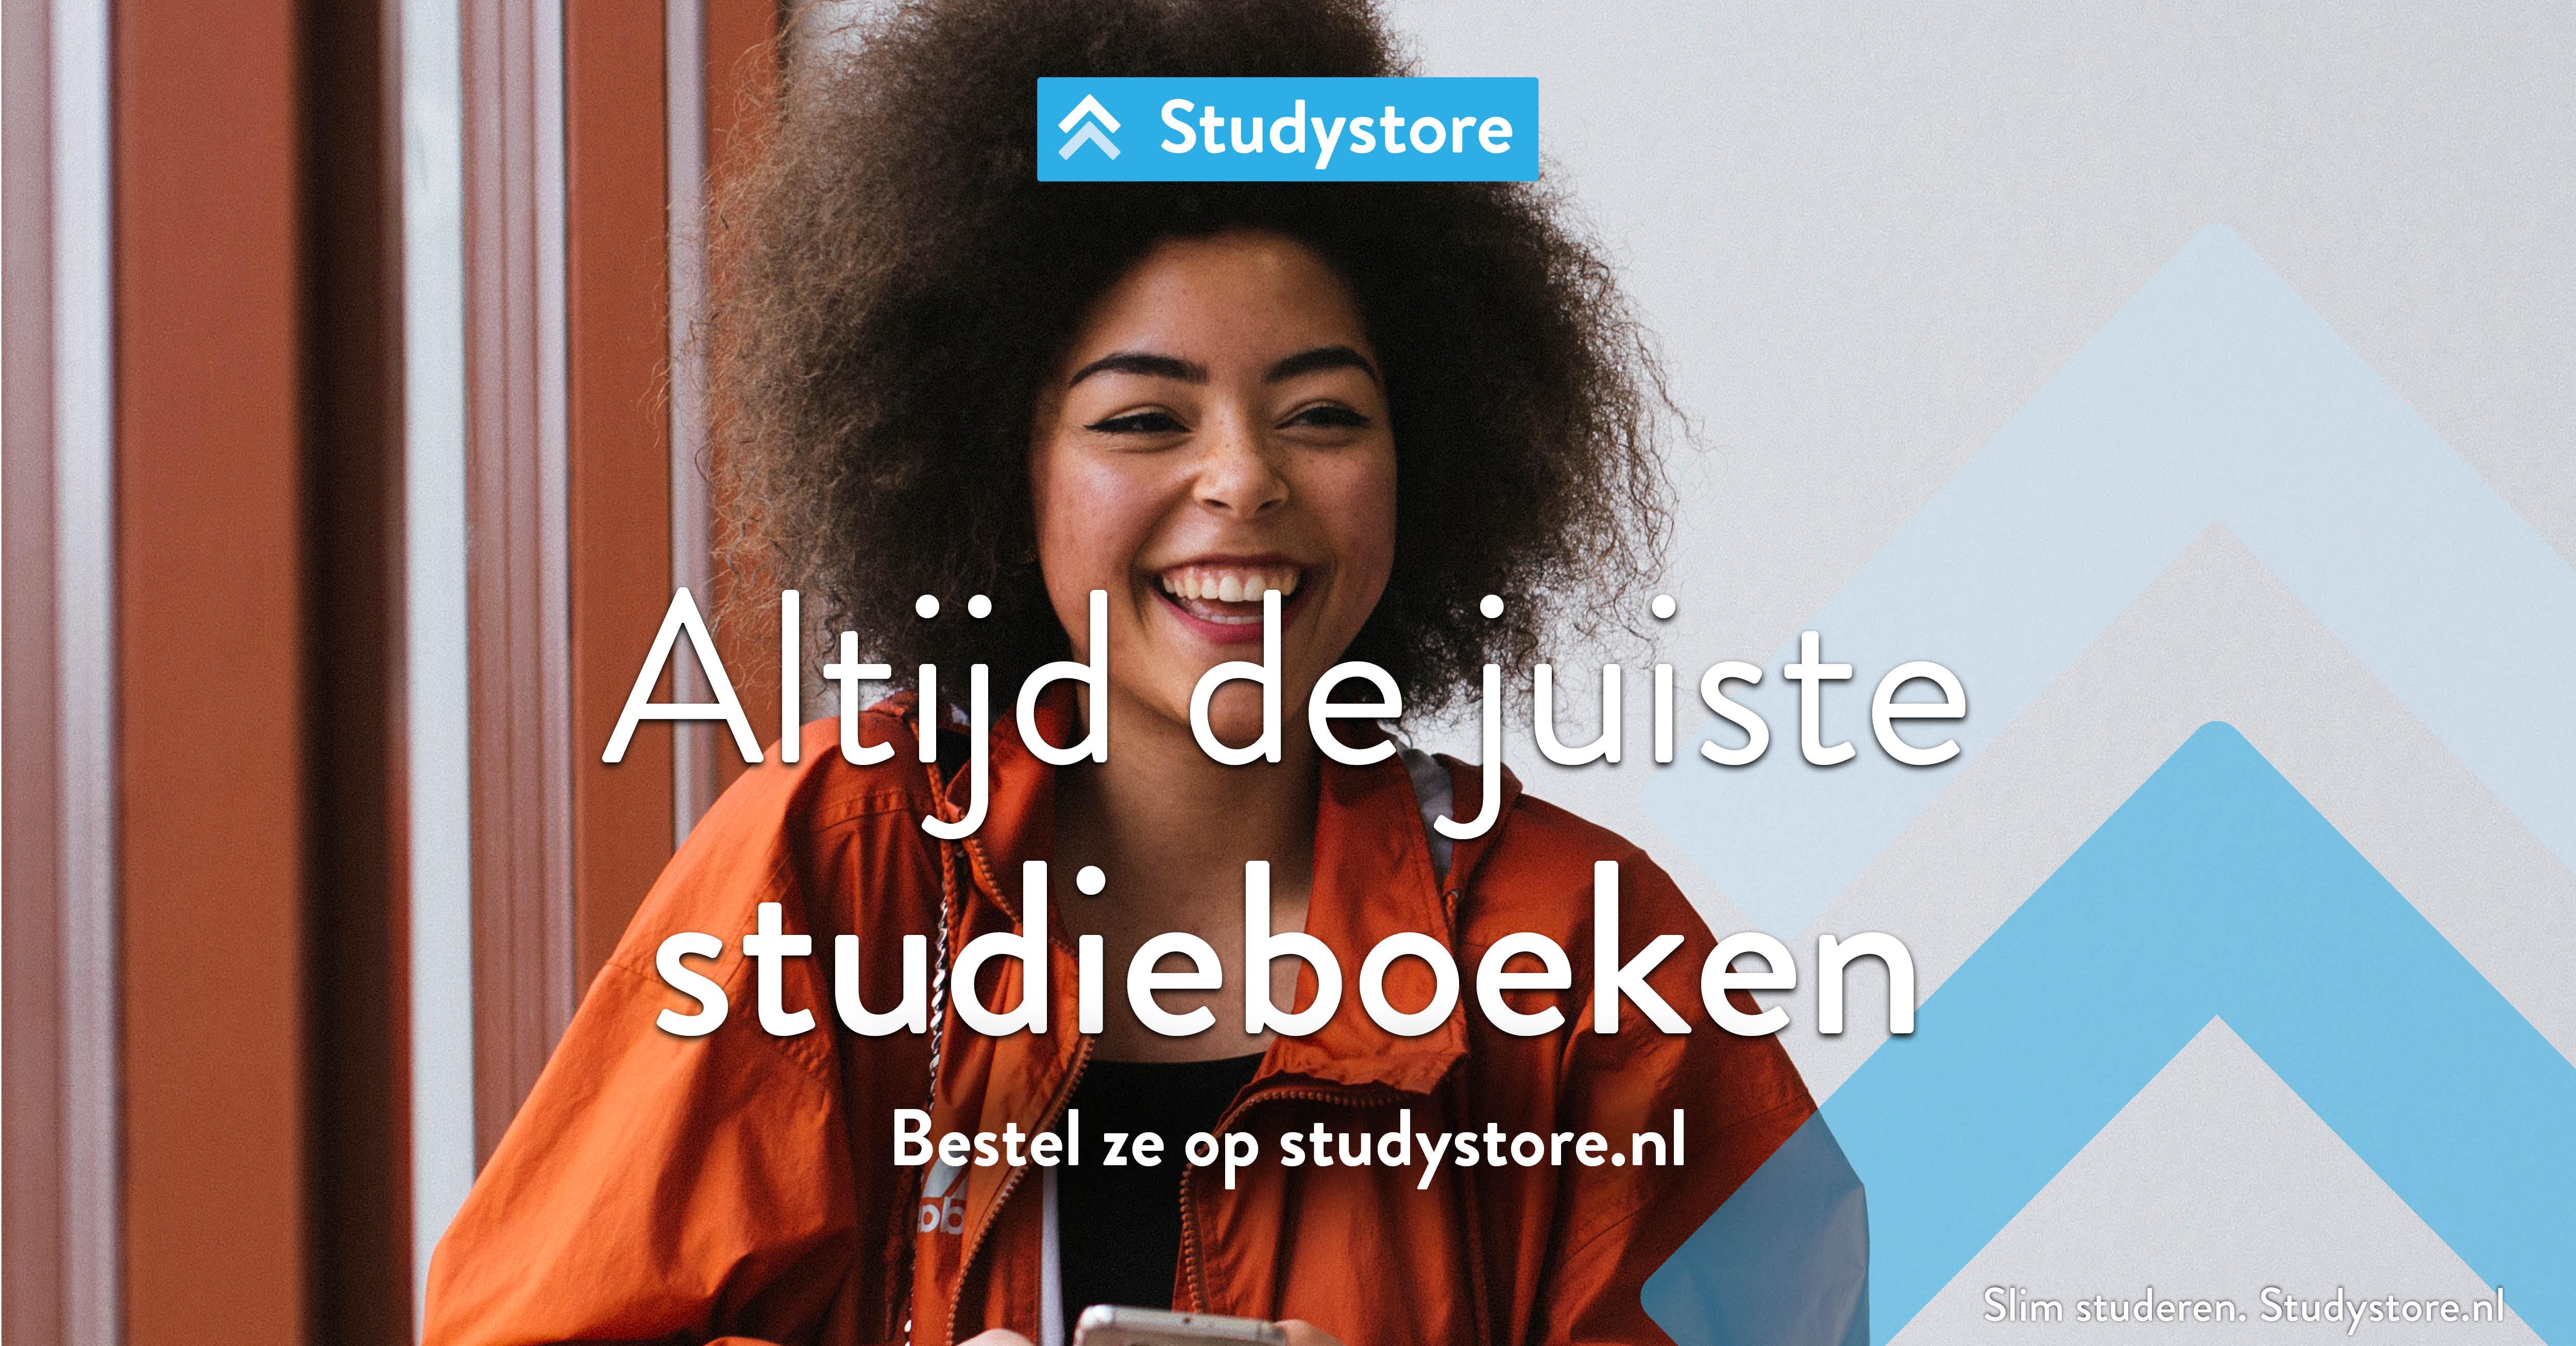 Studystore